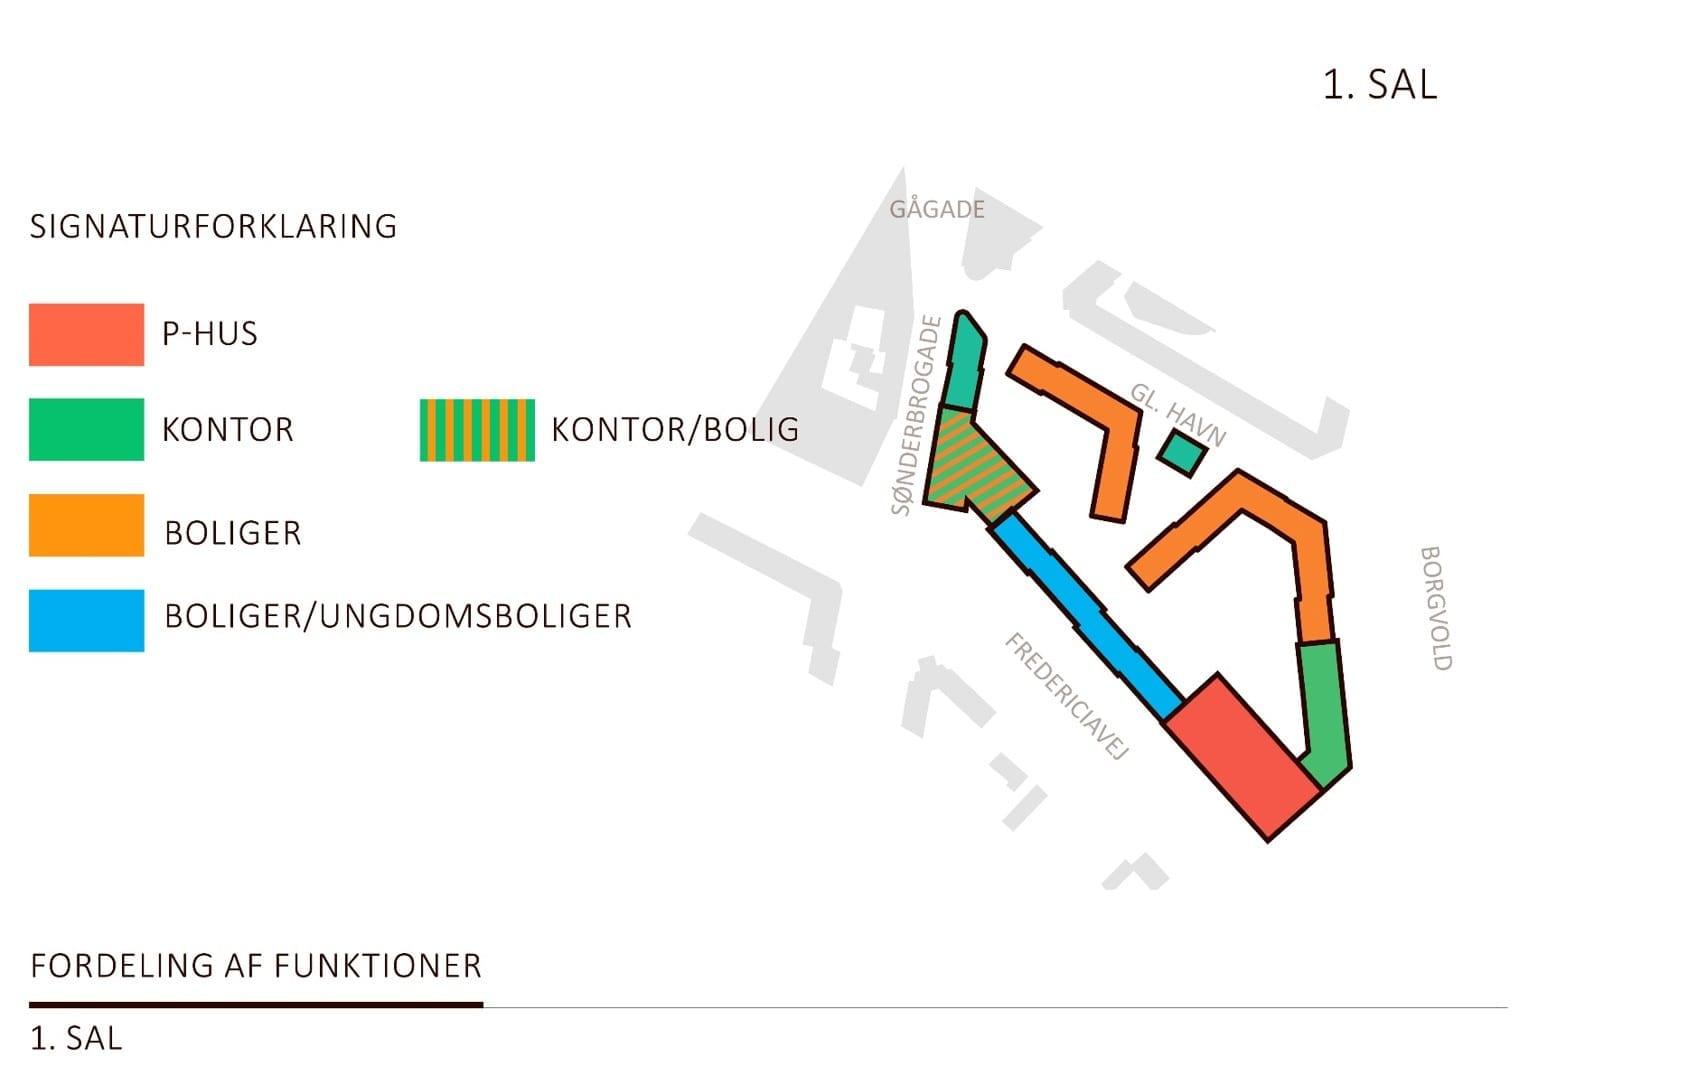 gammelhavn_diagram_1.sal_